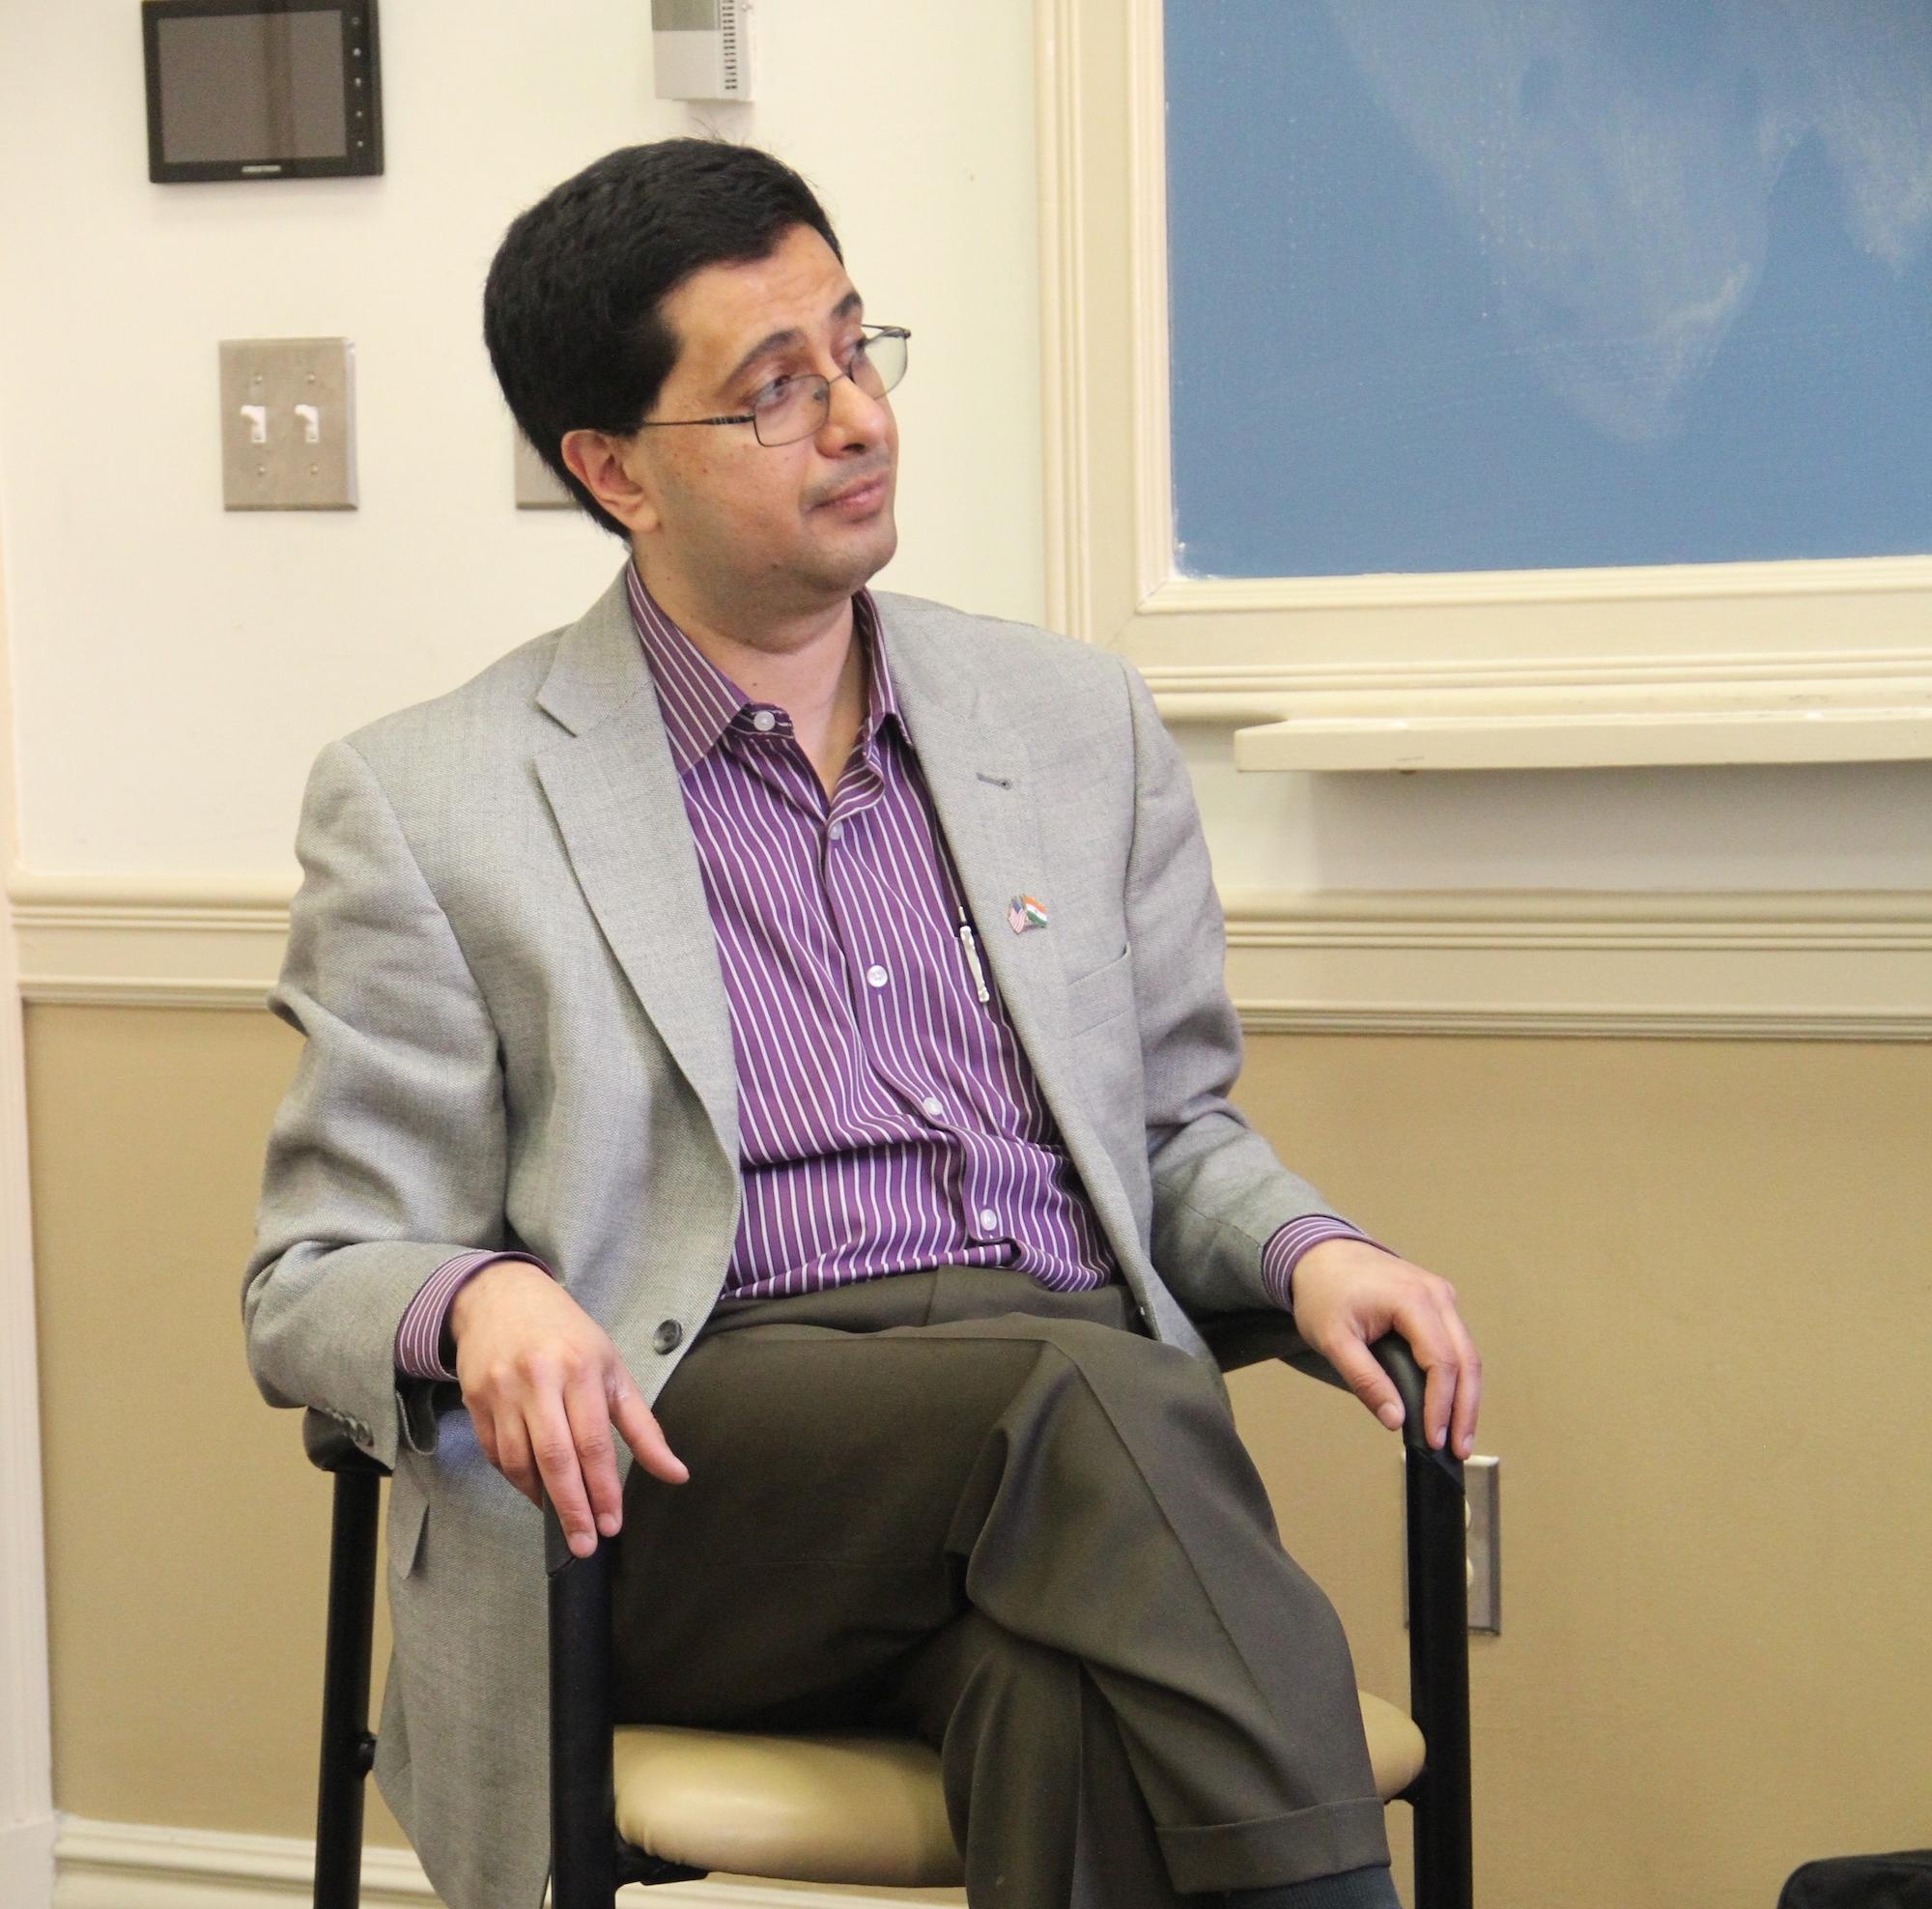 EXCLUSIVE: Sanjeev Joshipura, Executive Director of Indiaspora